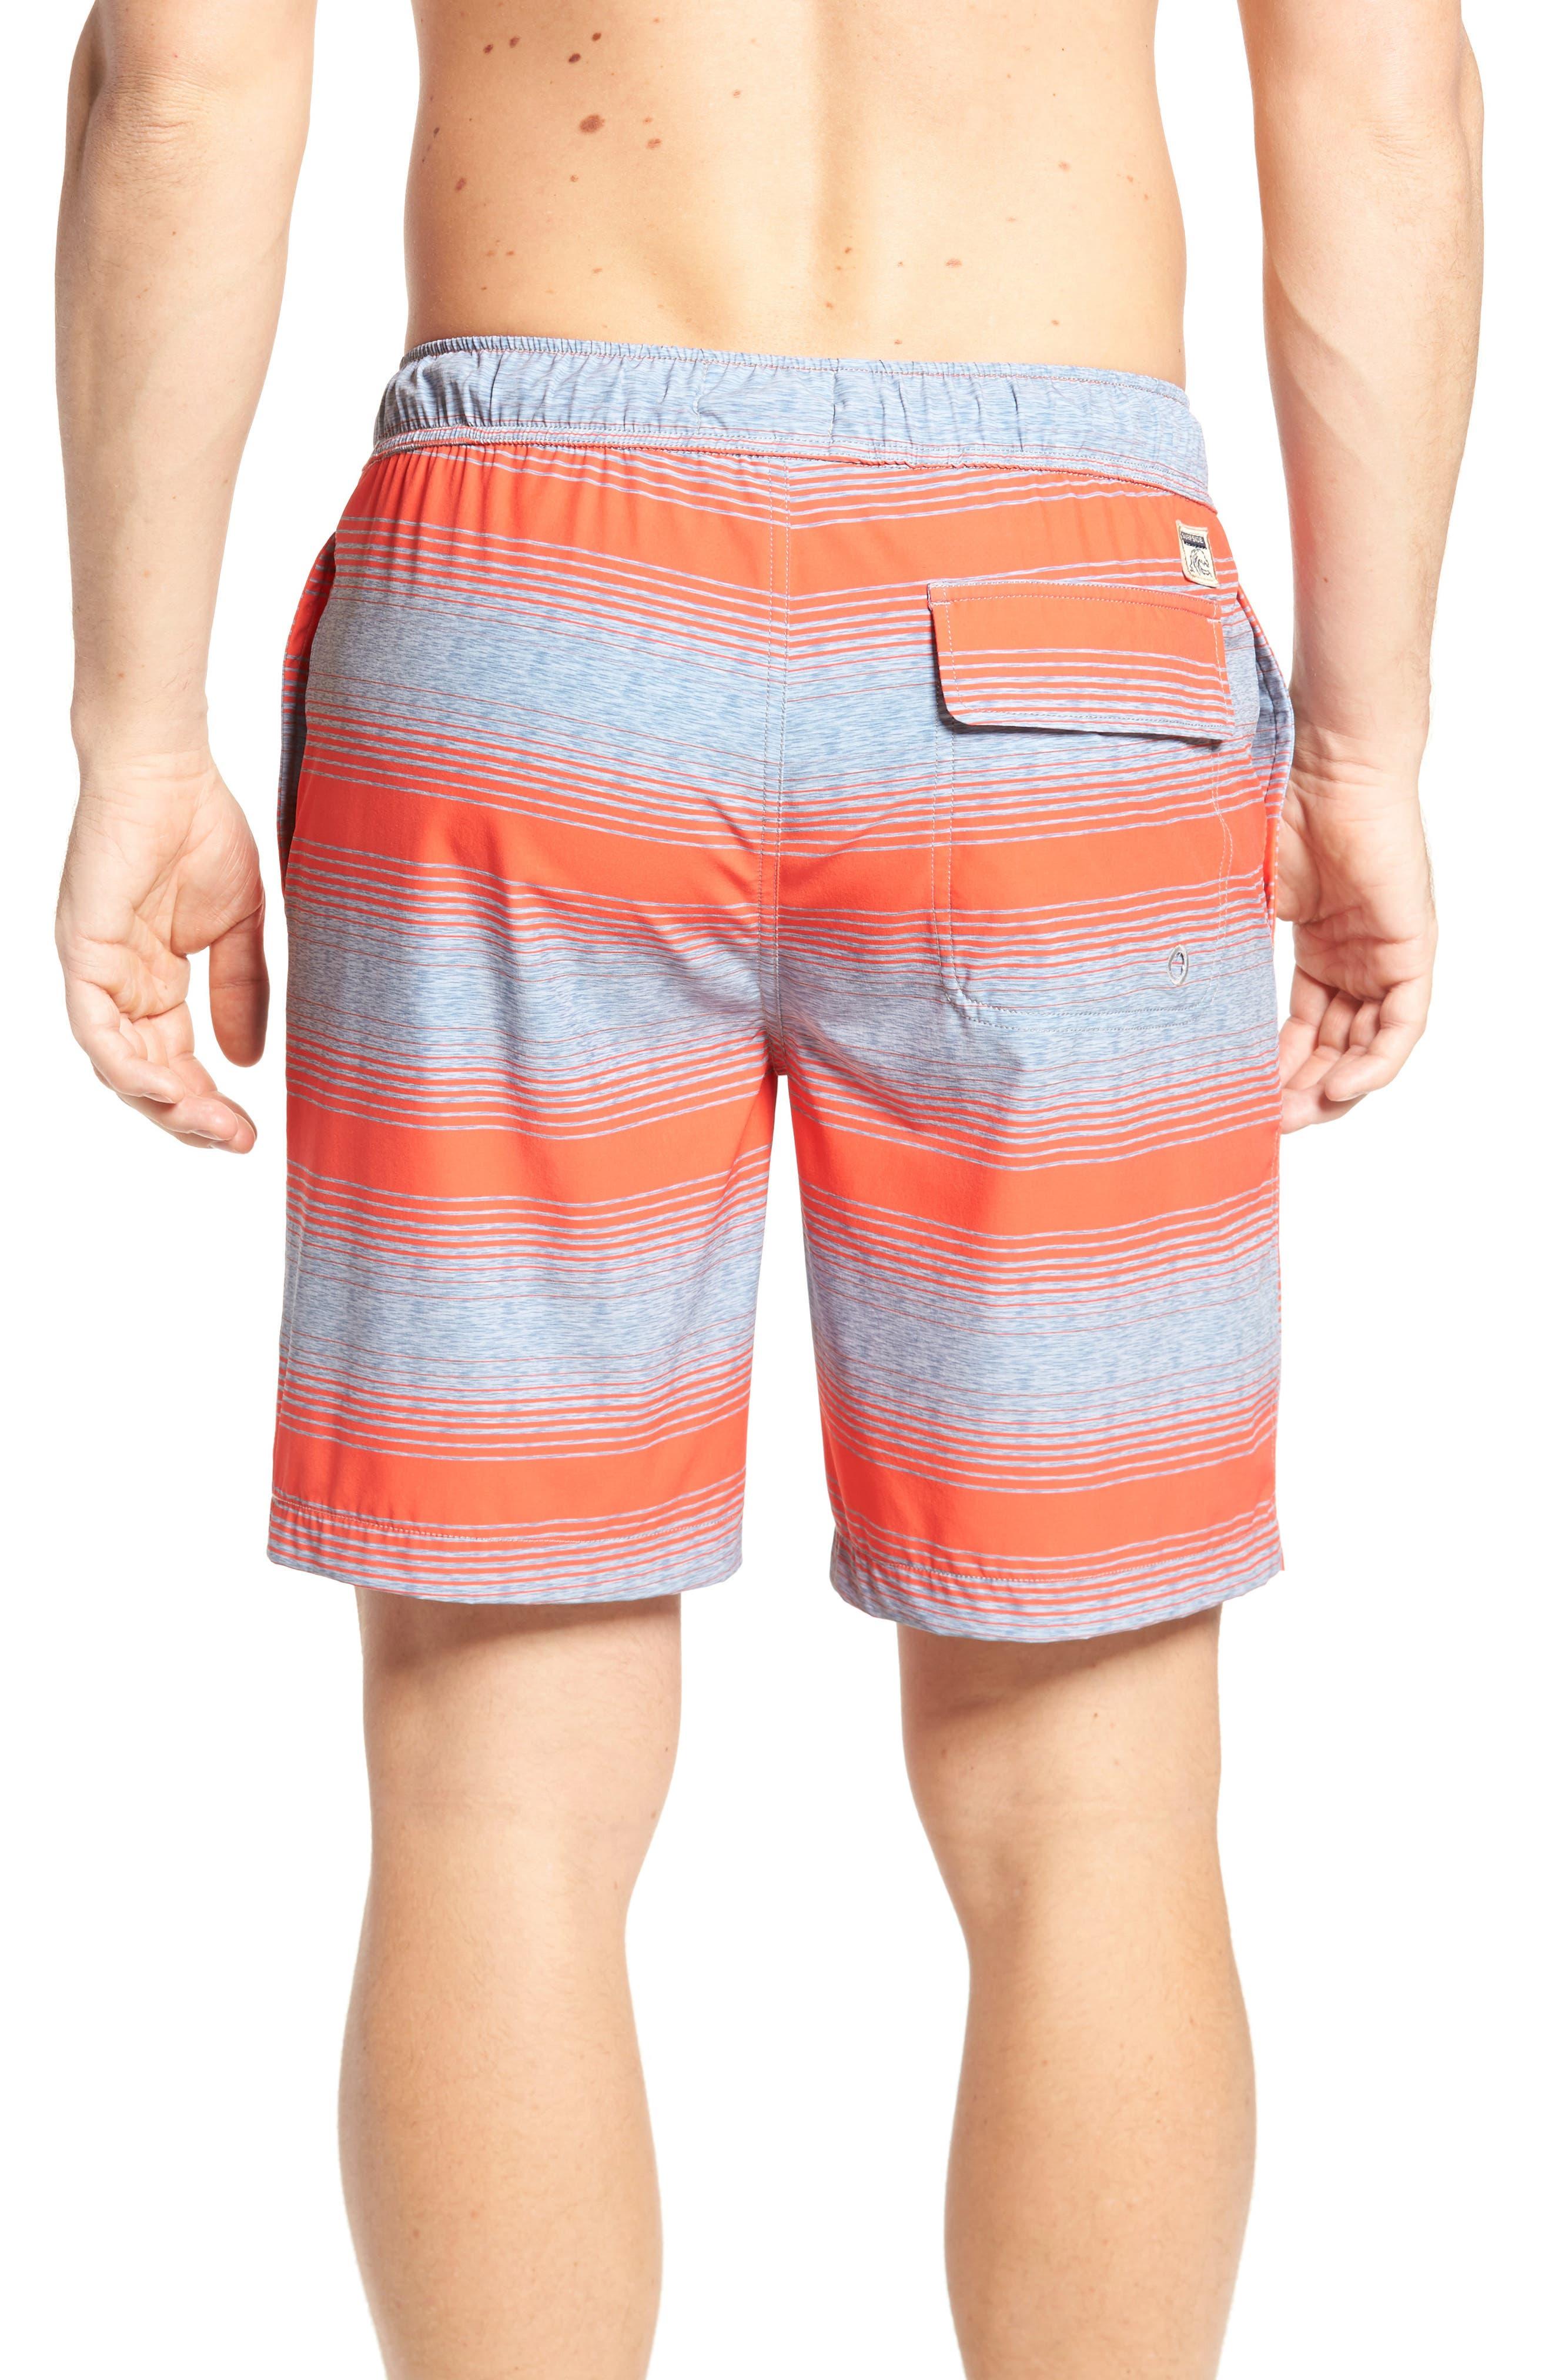 Stripe Swim Trunks,                             Alternate thumbnail 2, color,                             850